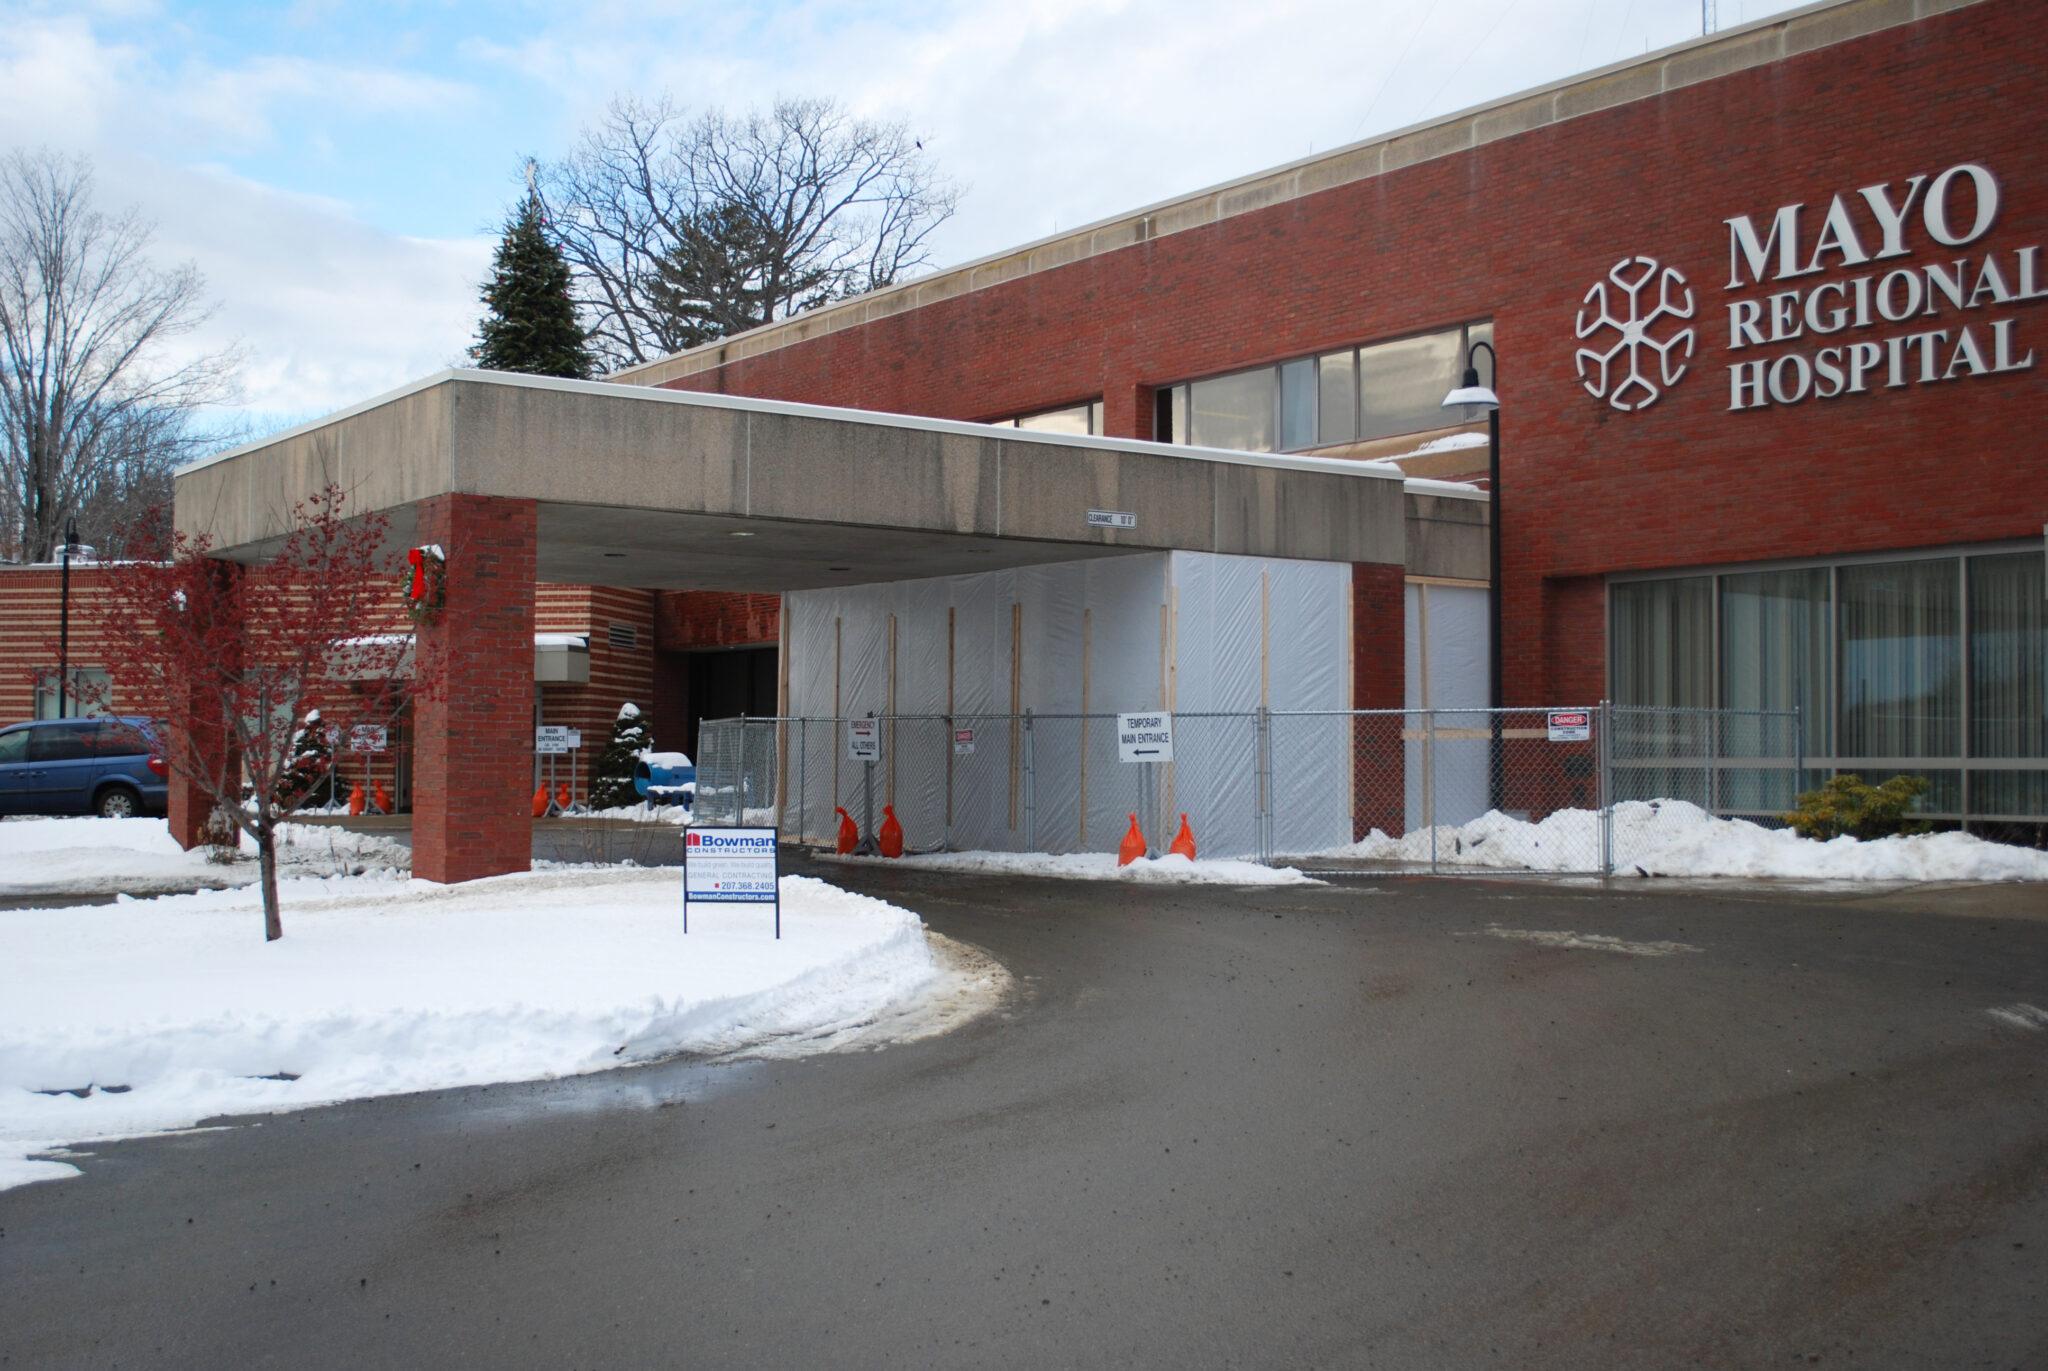 external photo of mayo regional hospital